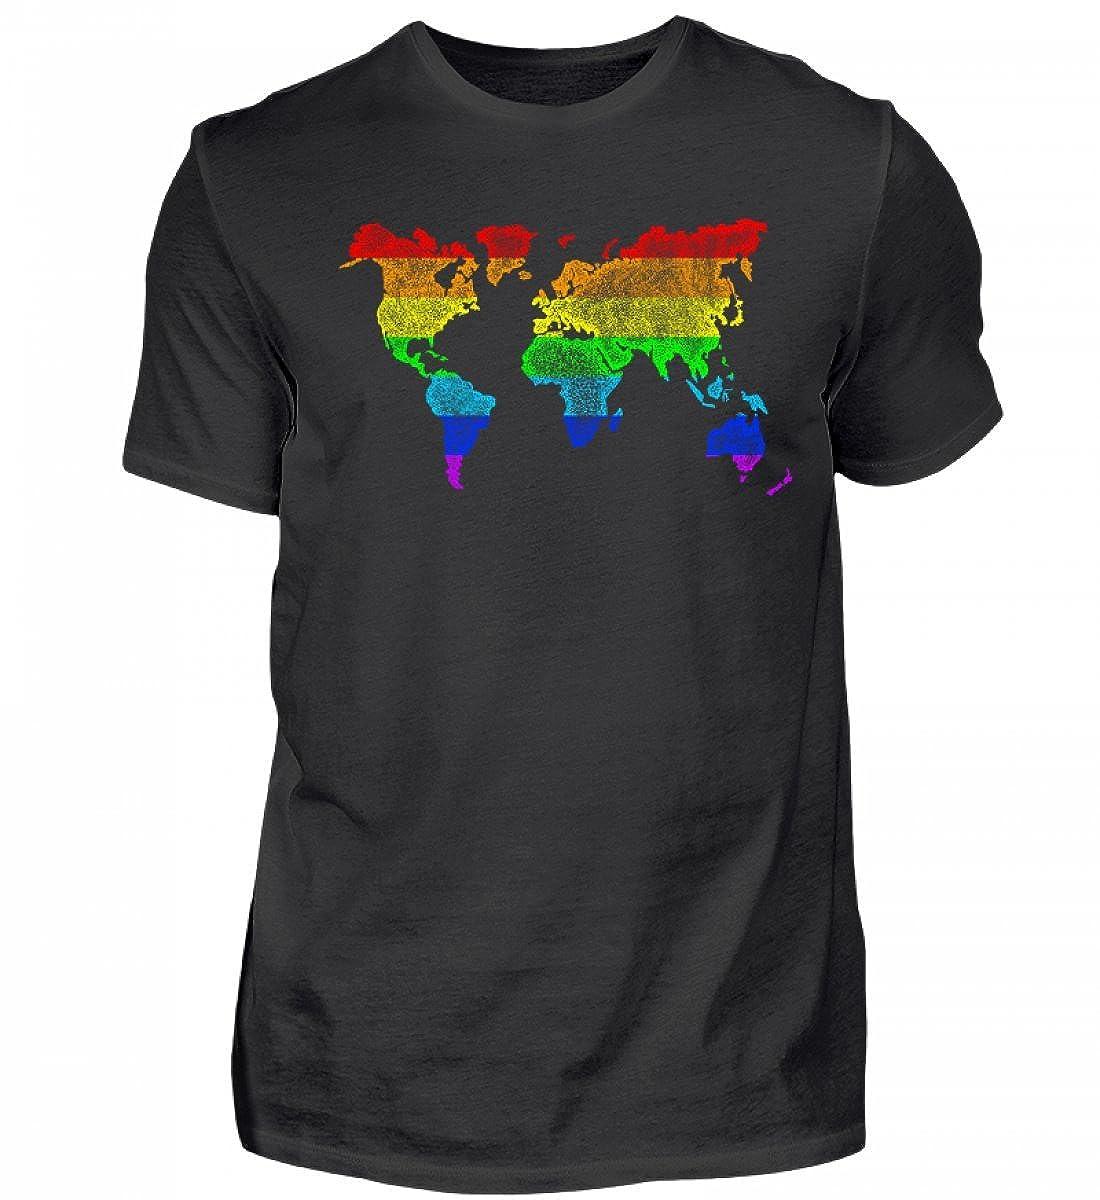 Regenbogen Weltkarte Worldmap - Geschenke für Schwule LGBT T-Shirt ...